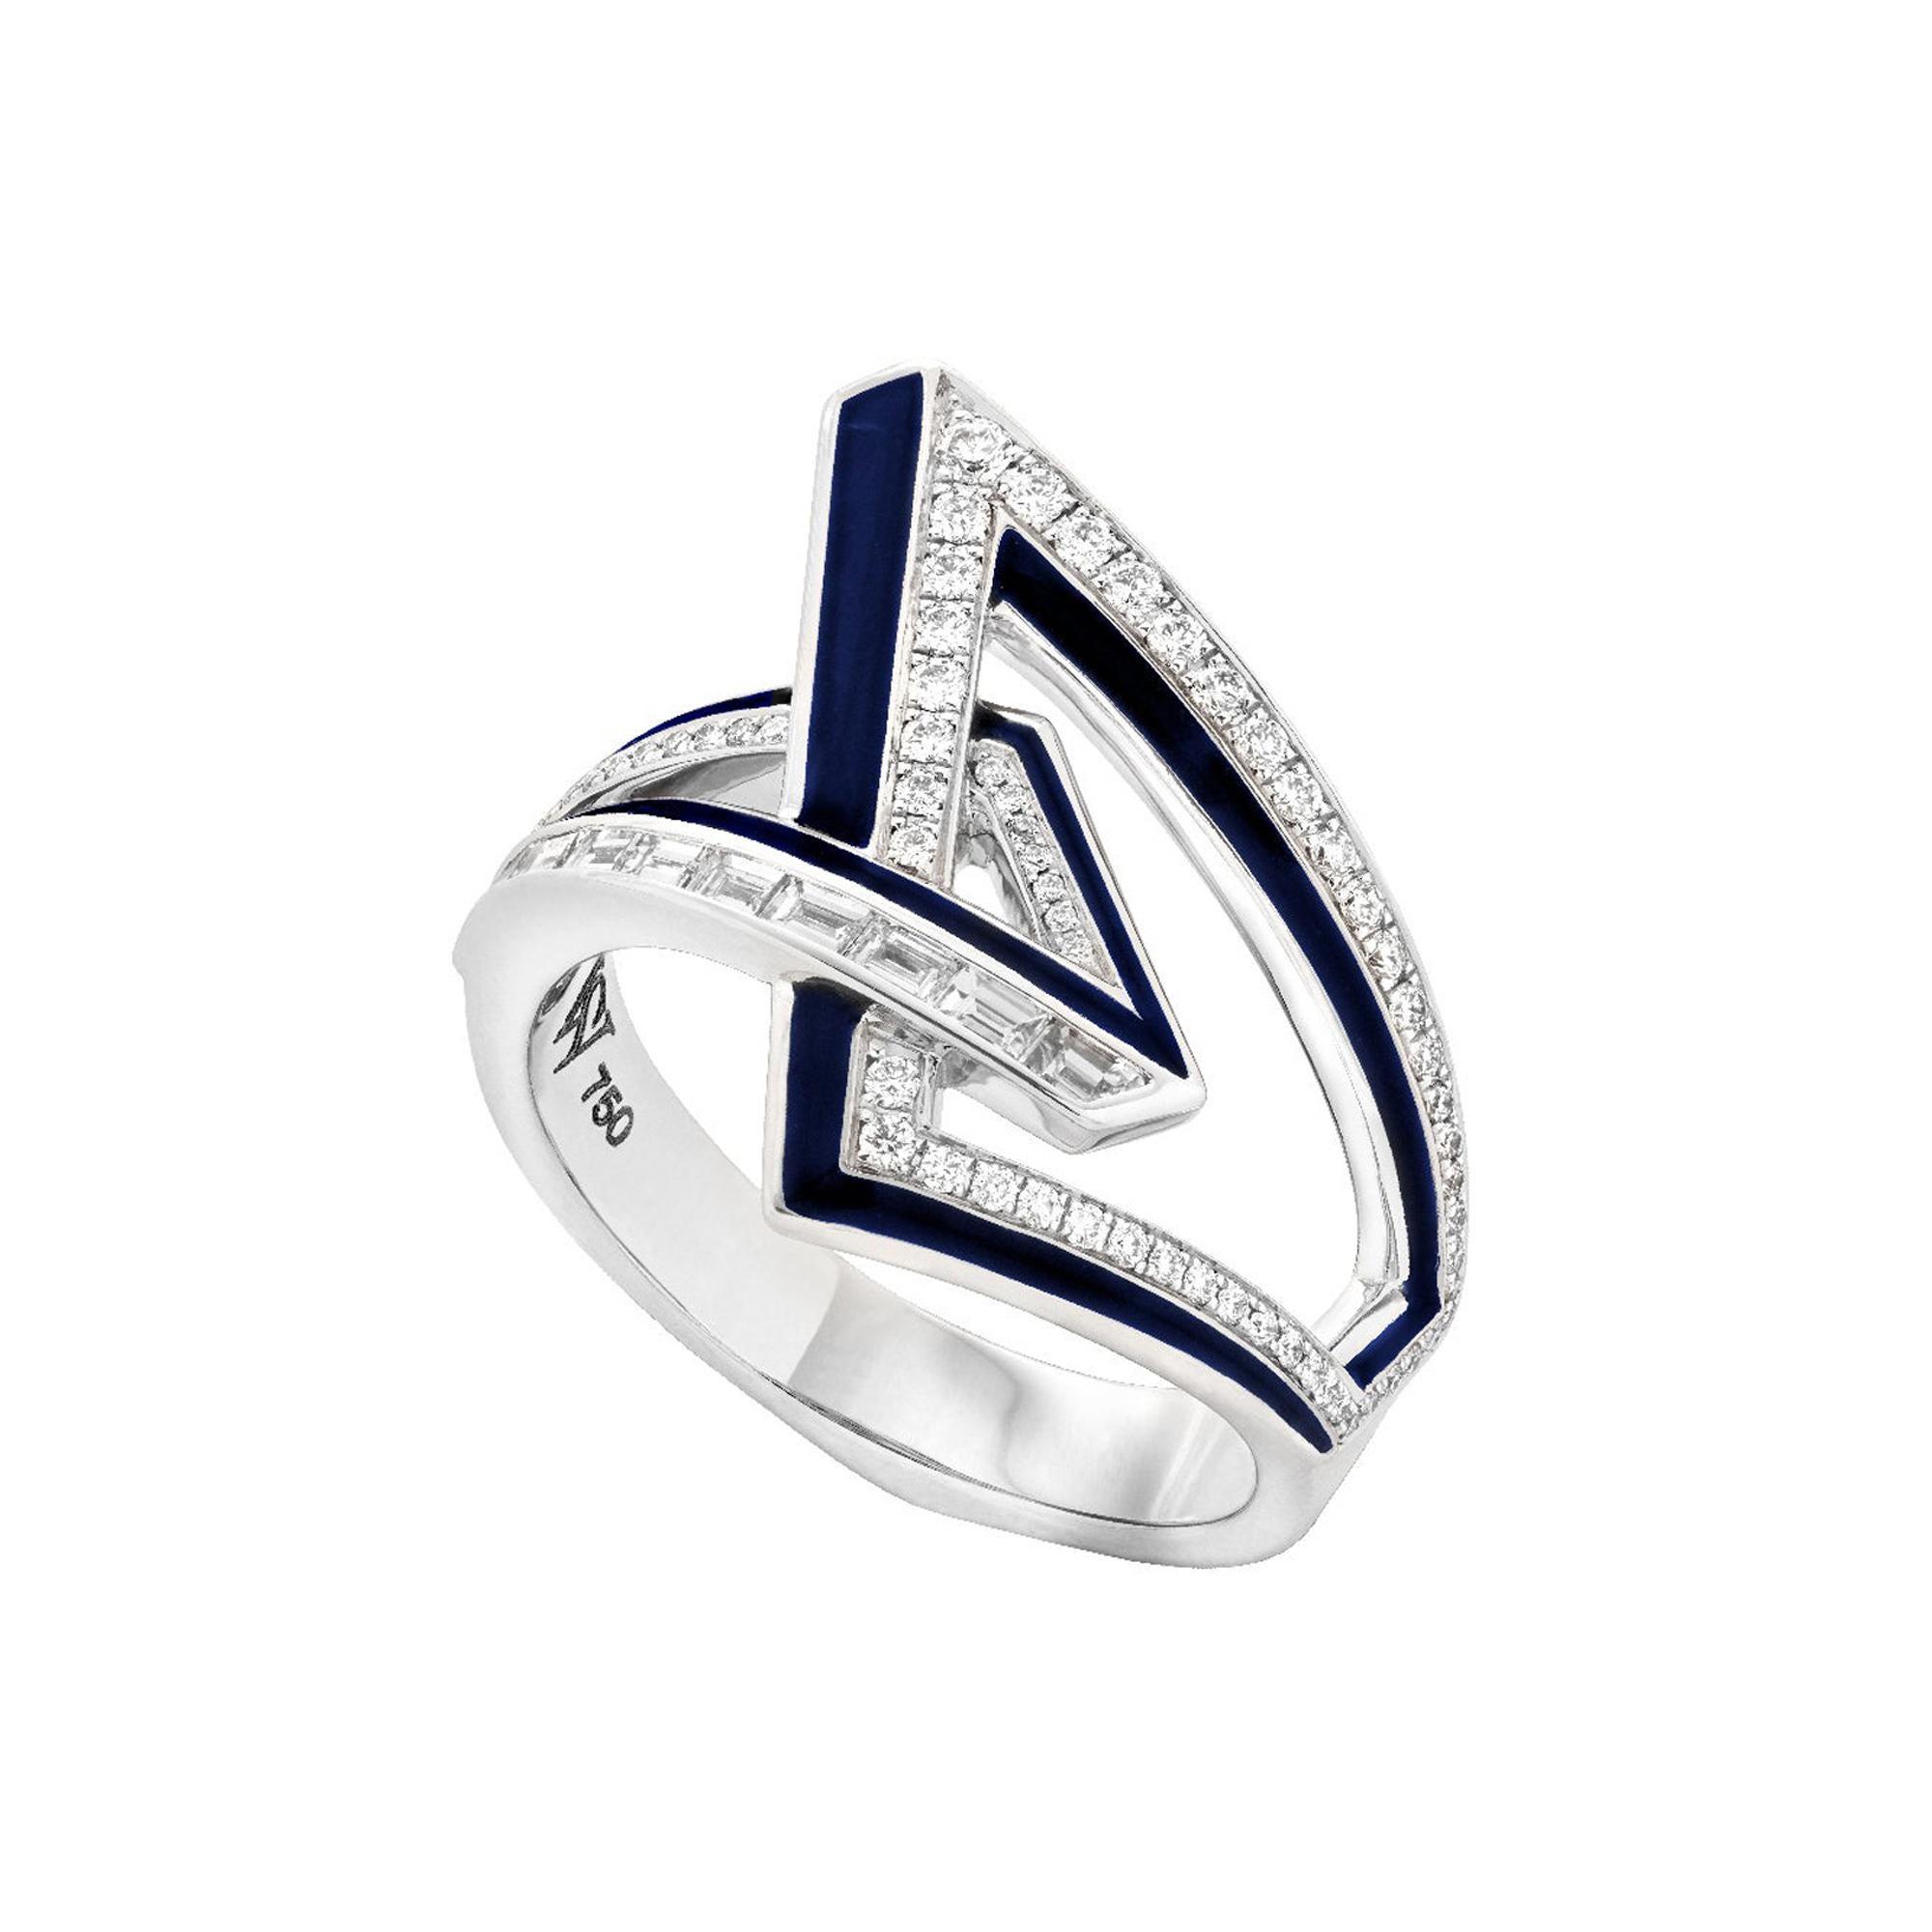 Stephen Webster Vertigo Obtuse 18 Carat Gold and White Diamond '0.35 Carat' Ring